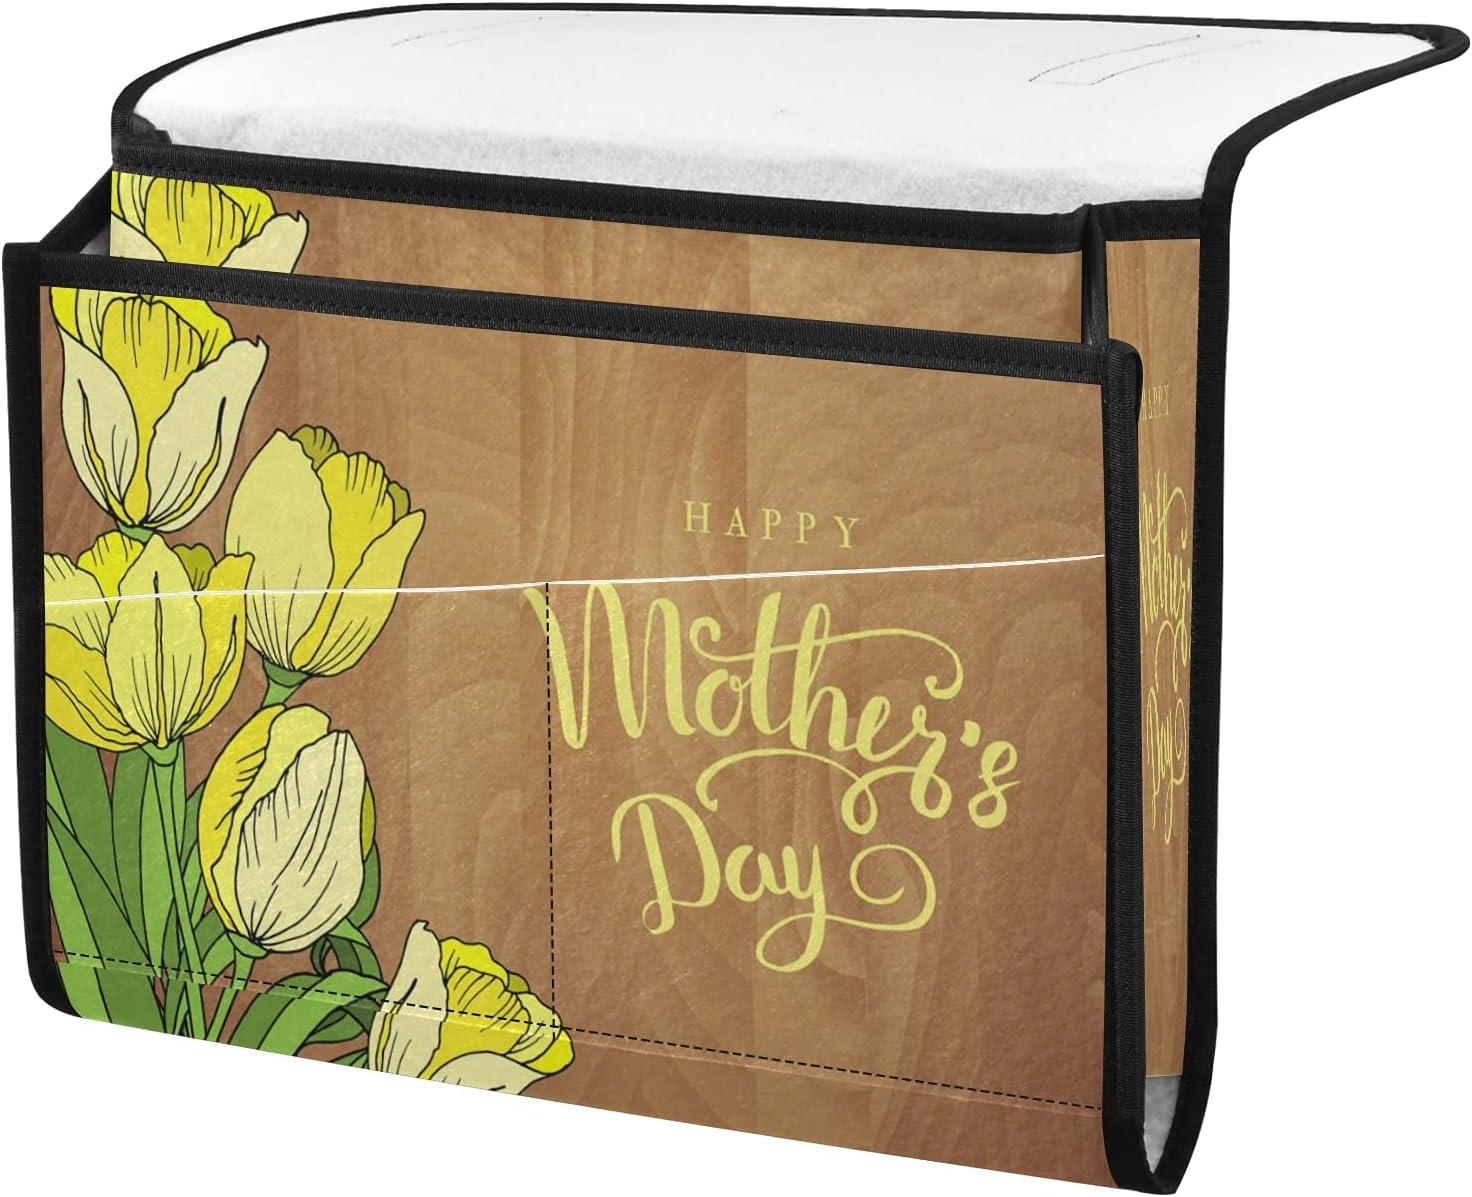 senya Albuquerque Mall Happy Mother's Day New life Tulip Bedside Floral Storage Organizer